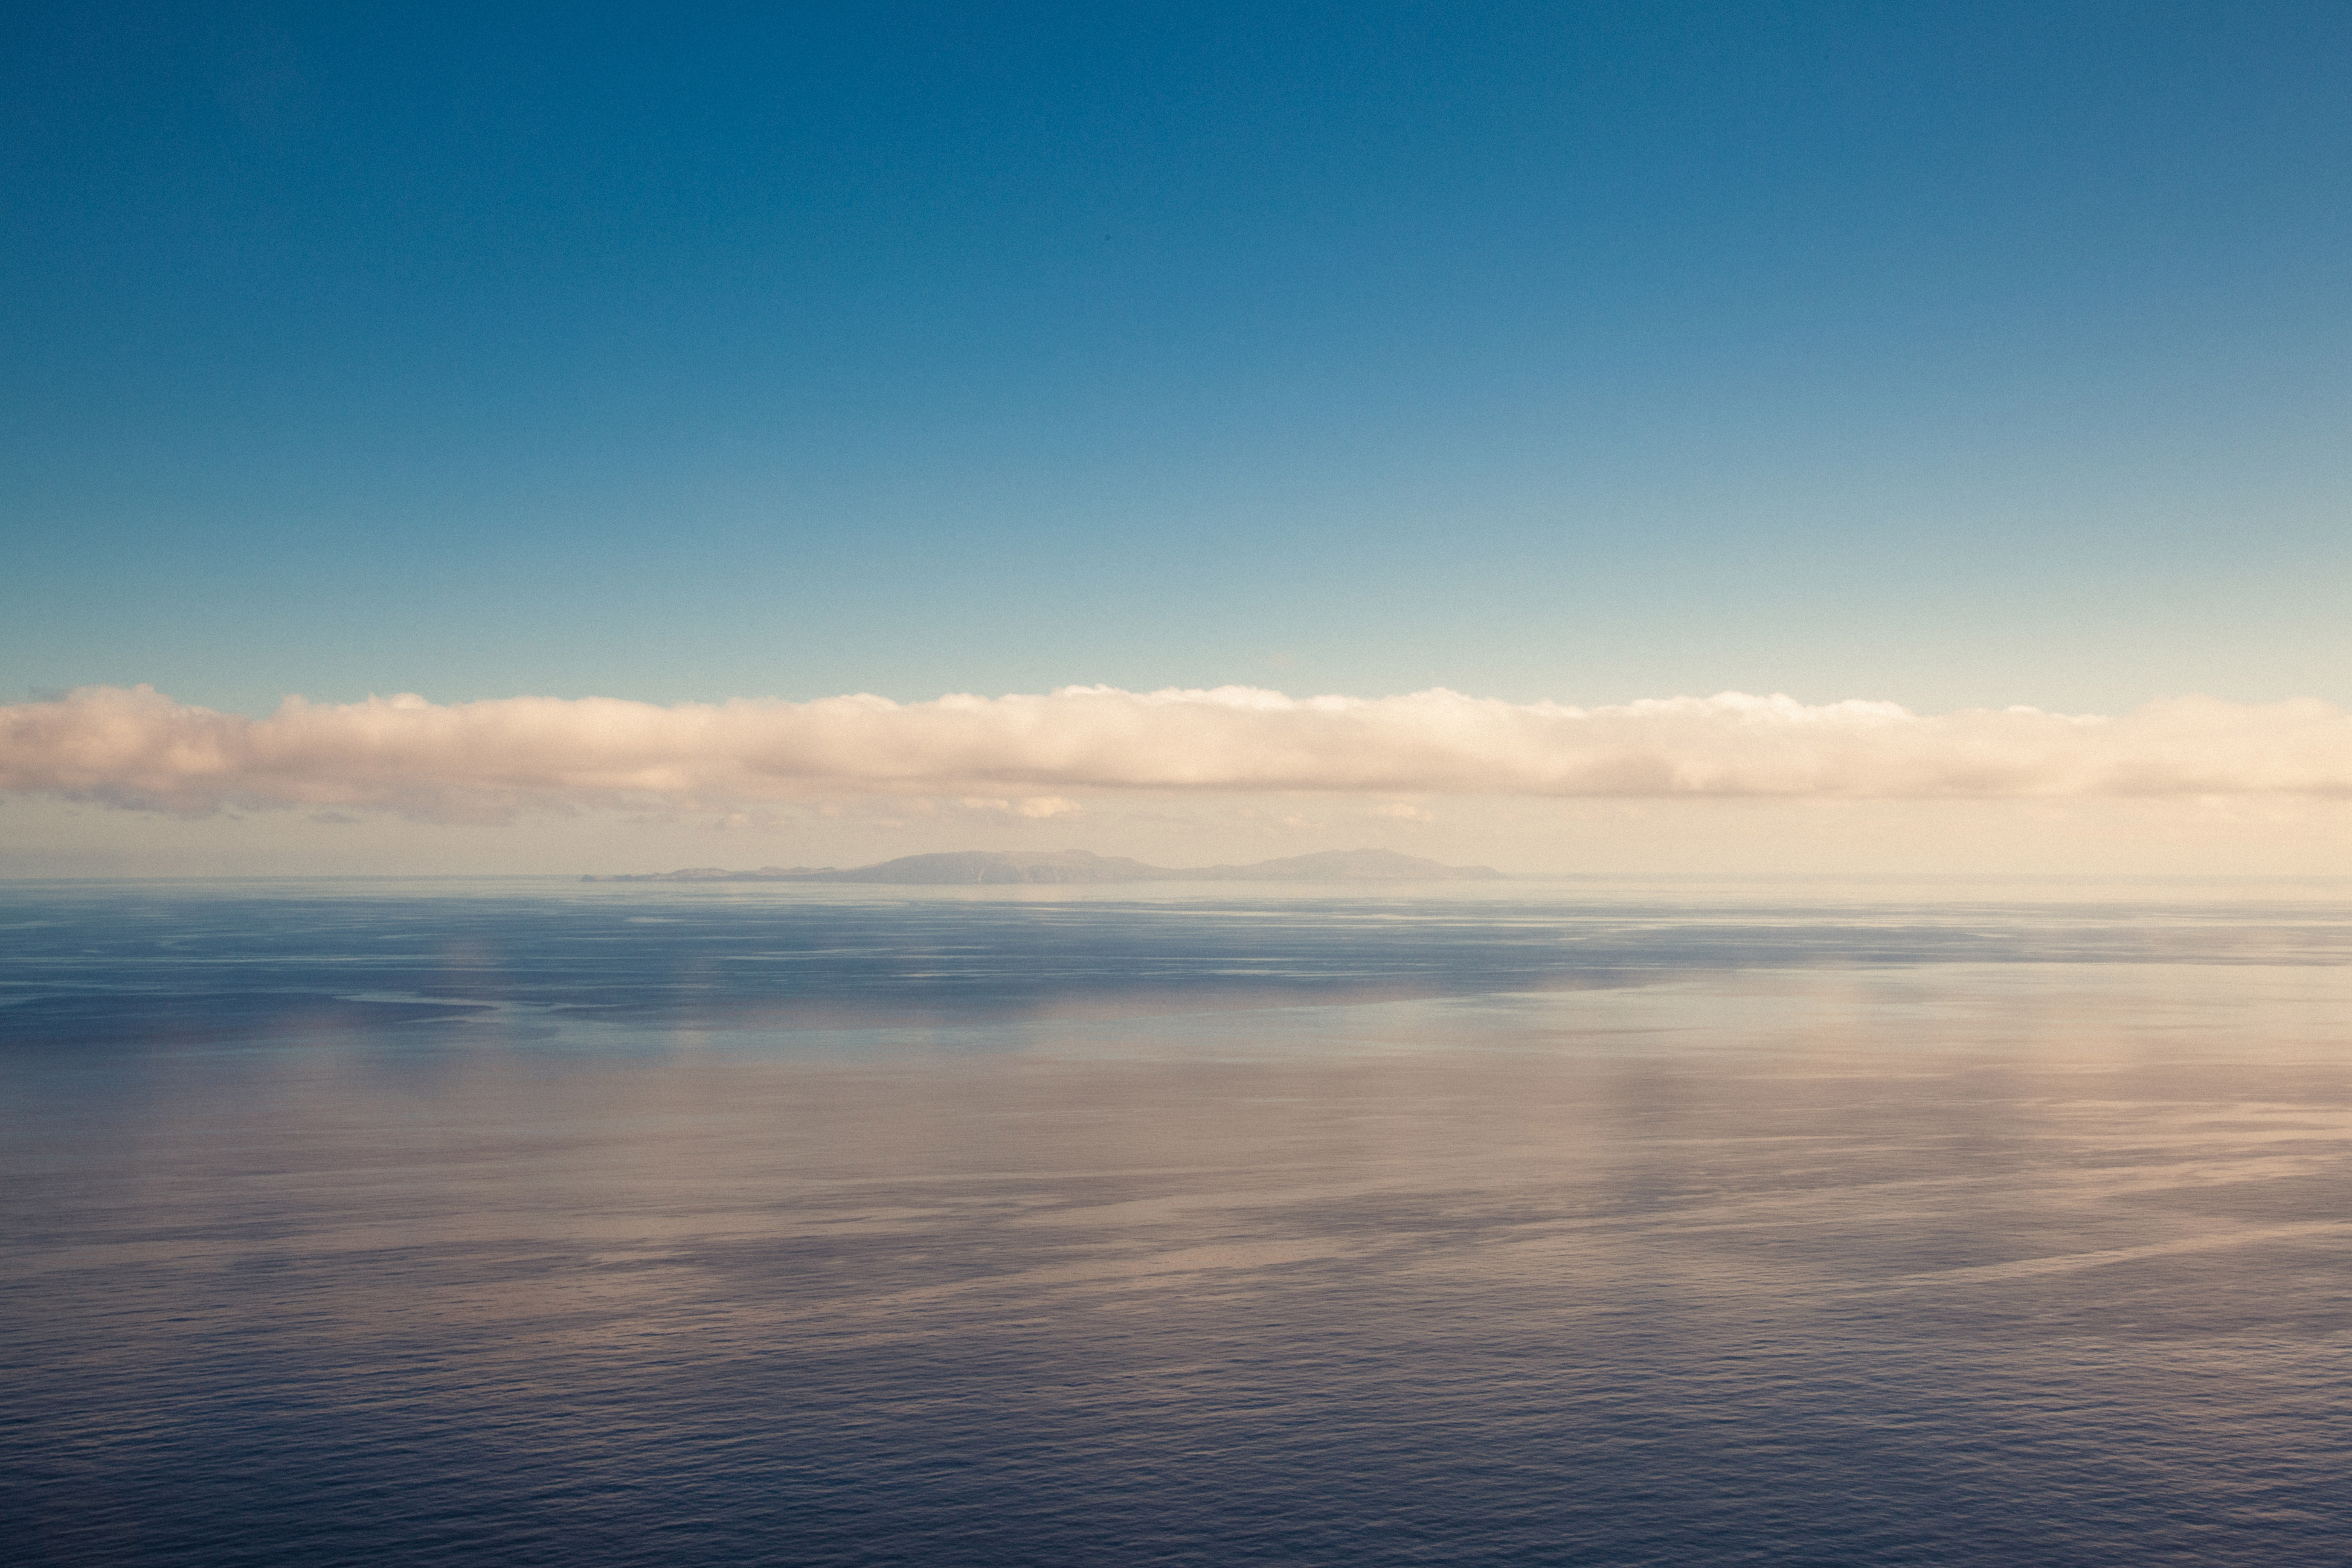 Infinite ocean, reflection, clouds, sky, infinite, mirror, sea, horizon, water, sky, clouds